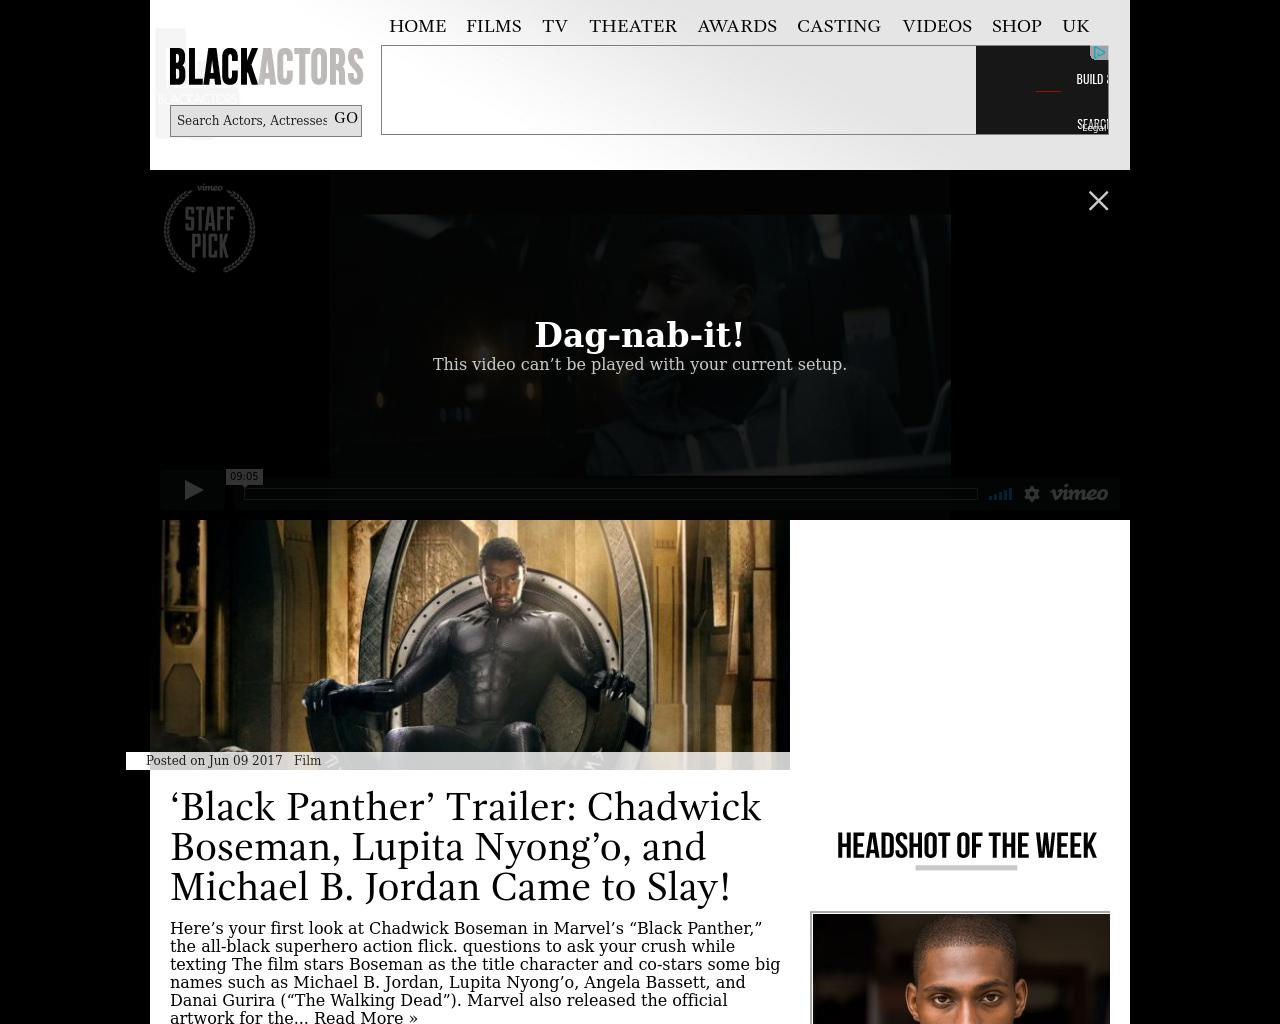 Black-Actors-Advertising-Reviews-Pricing